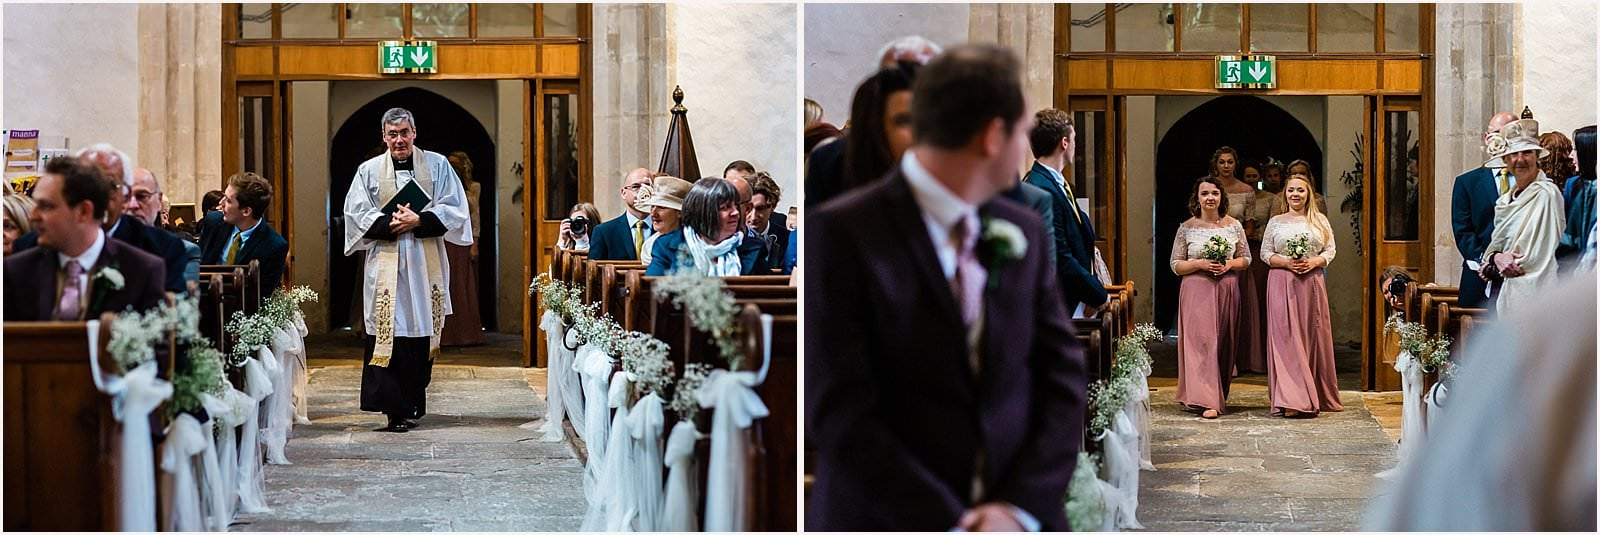 Breathtaking Nunney Castle, Somerset Wedding Photographer  - Sarah & Daniel 24